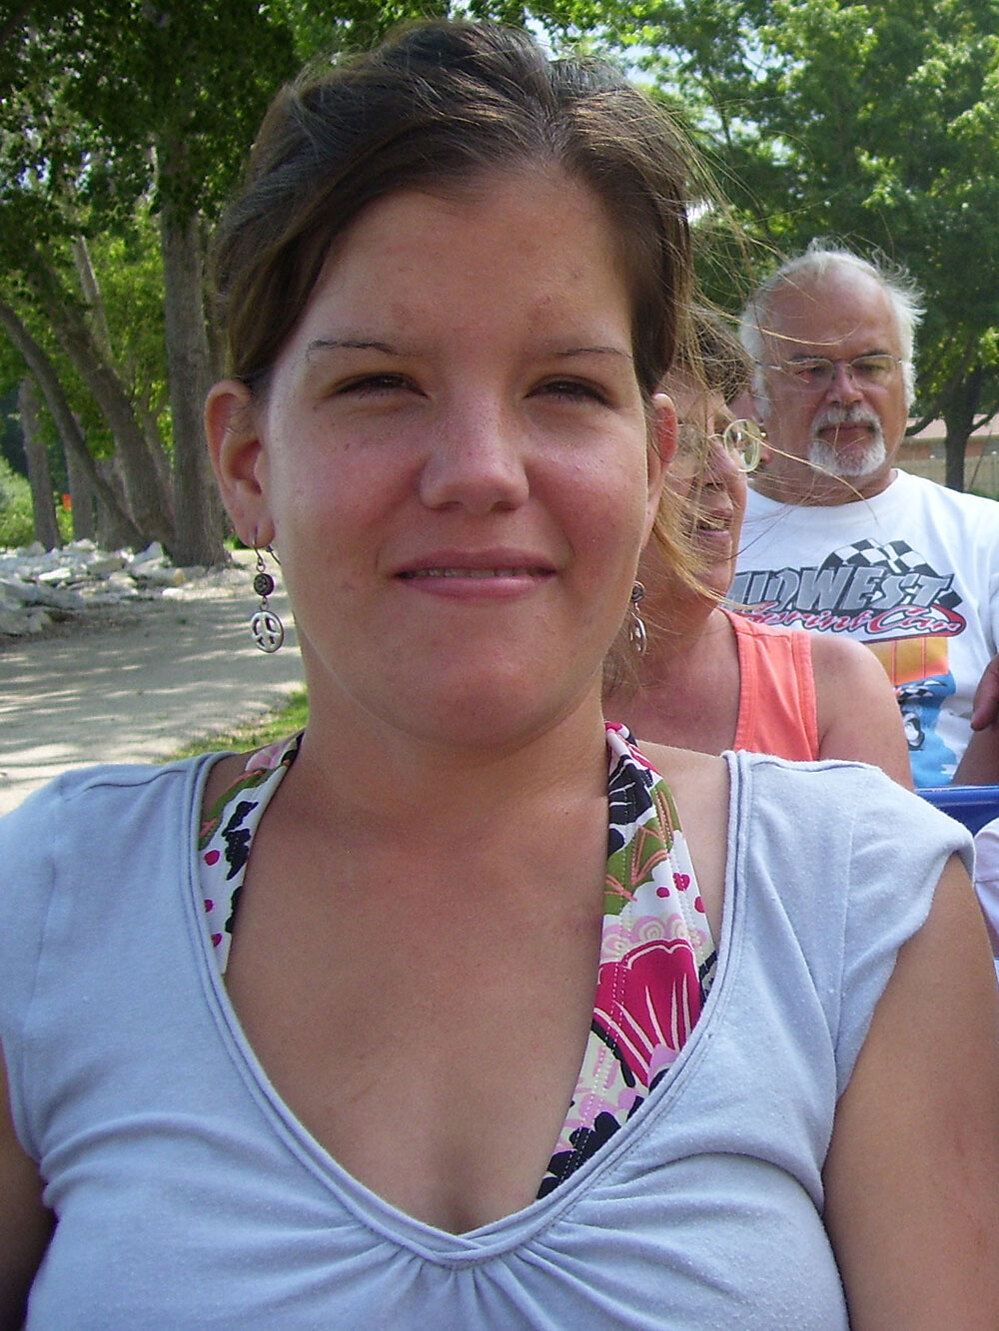 Erica Thiel, has a rare genetic disease MPS 1.